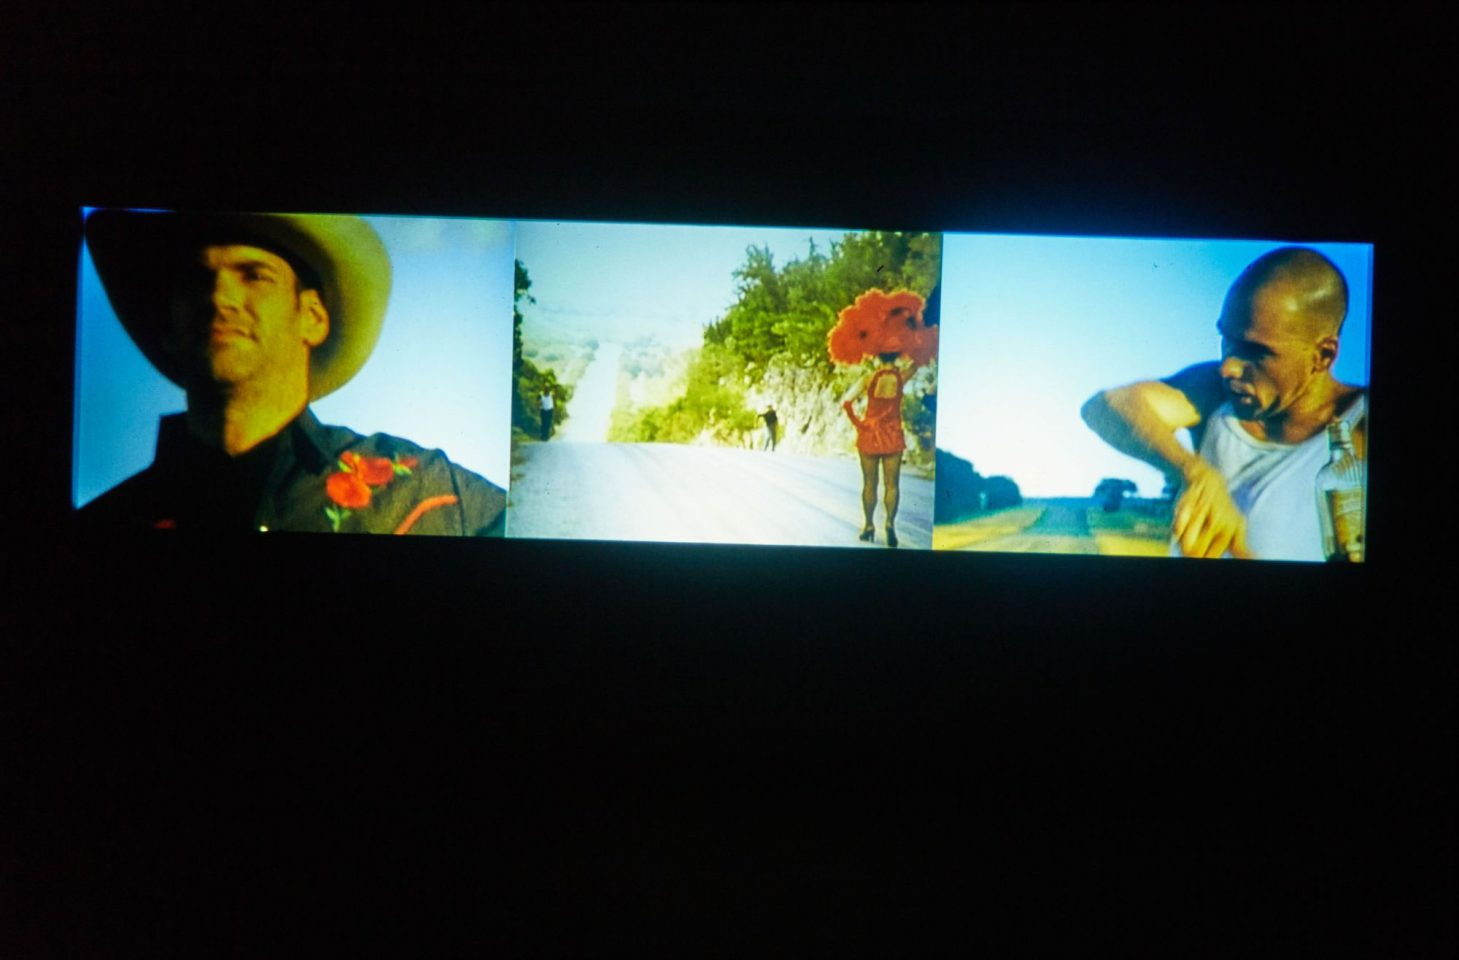 Installation view of Isaac Julien & Javier de Frutos's Cinerama.